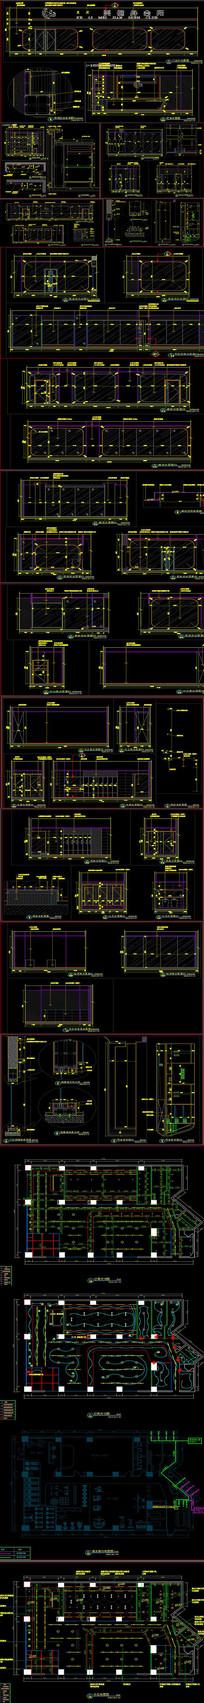 全套时尚健身房CAD施工图